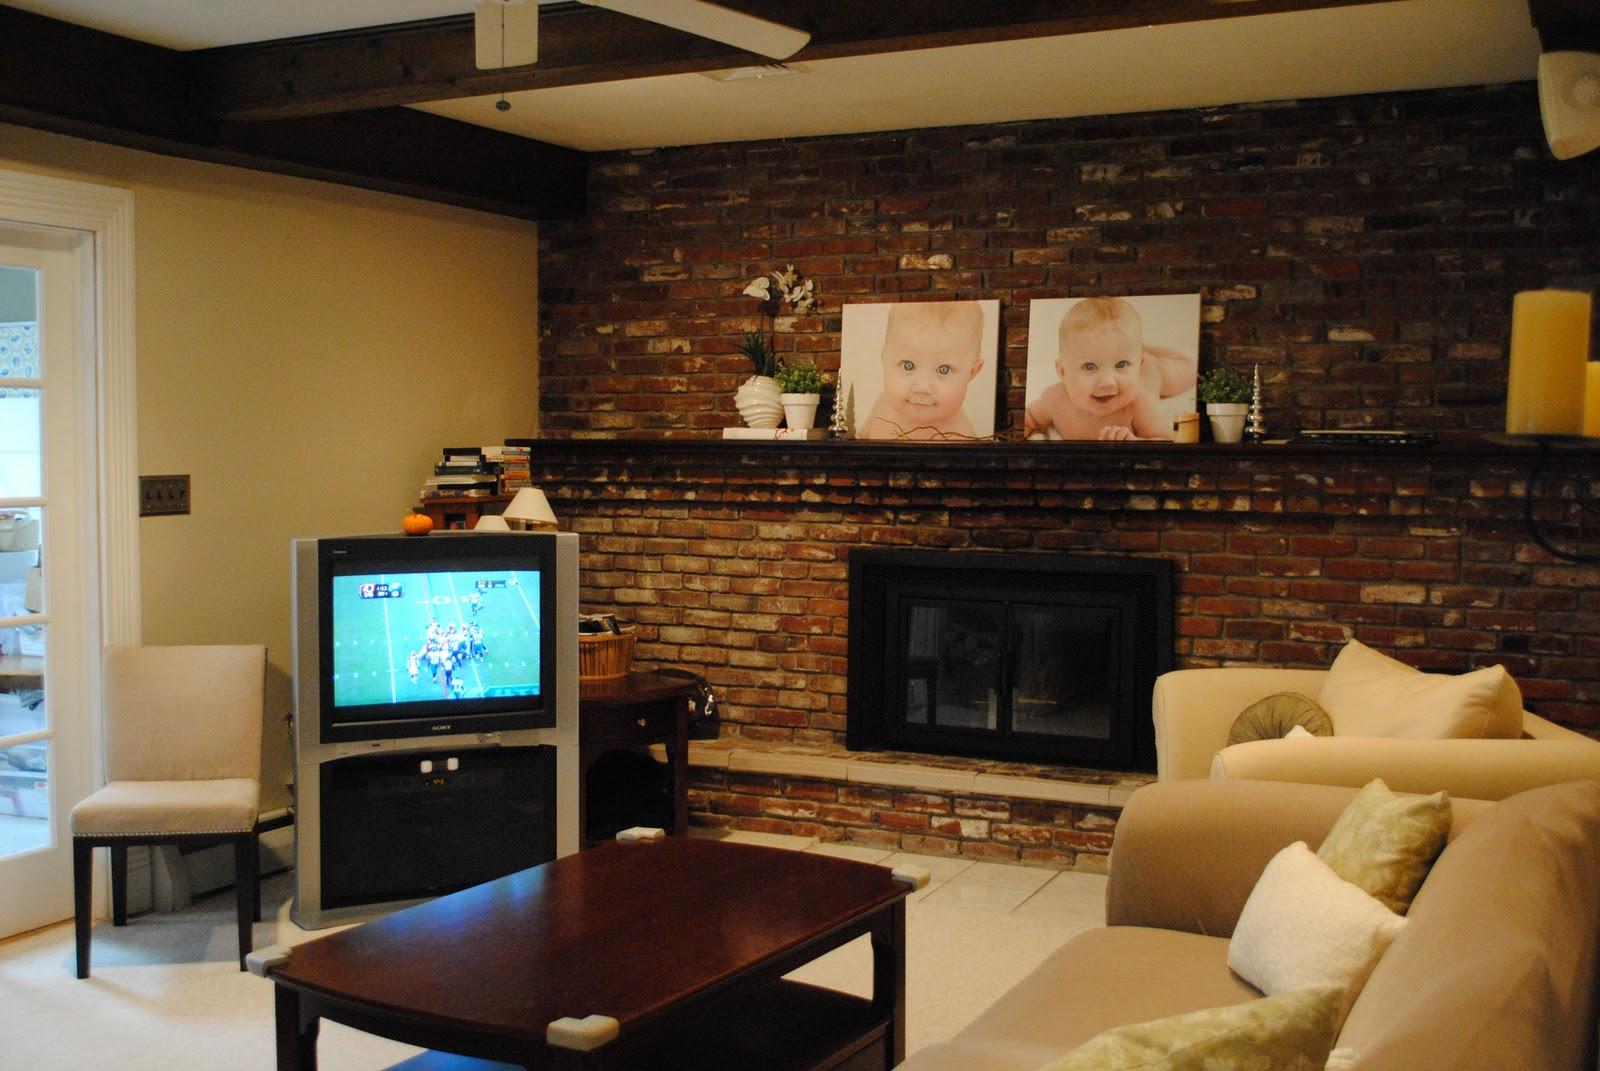 renovating furniture ideas. Living Room Renovation: Furniture, Art, And Lighting Renovating Furniture Ideas R